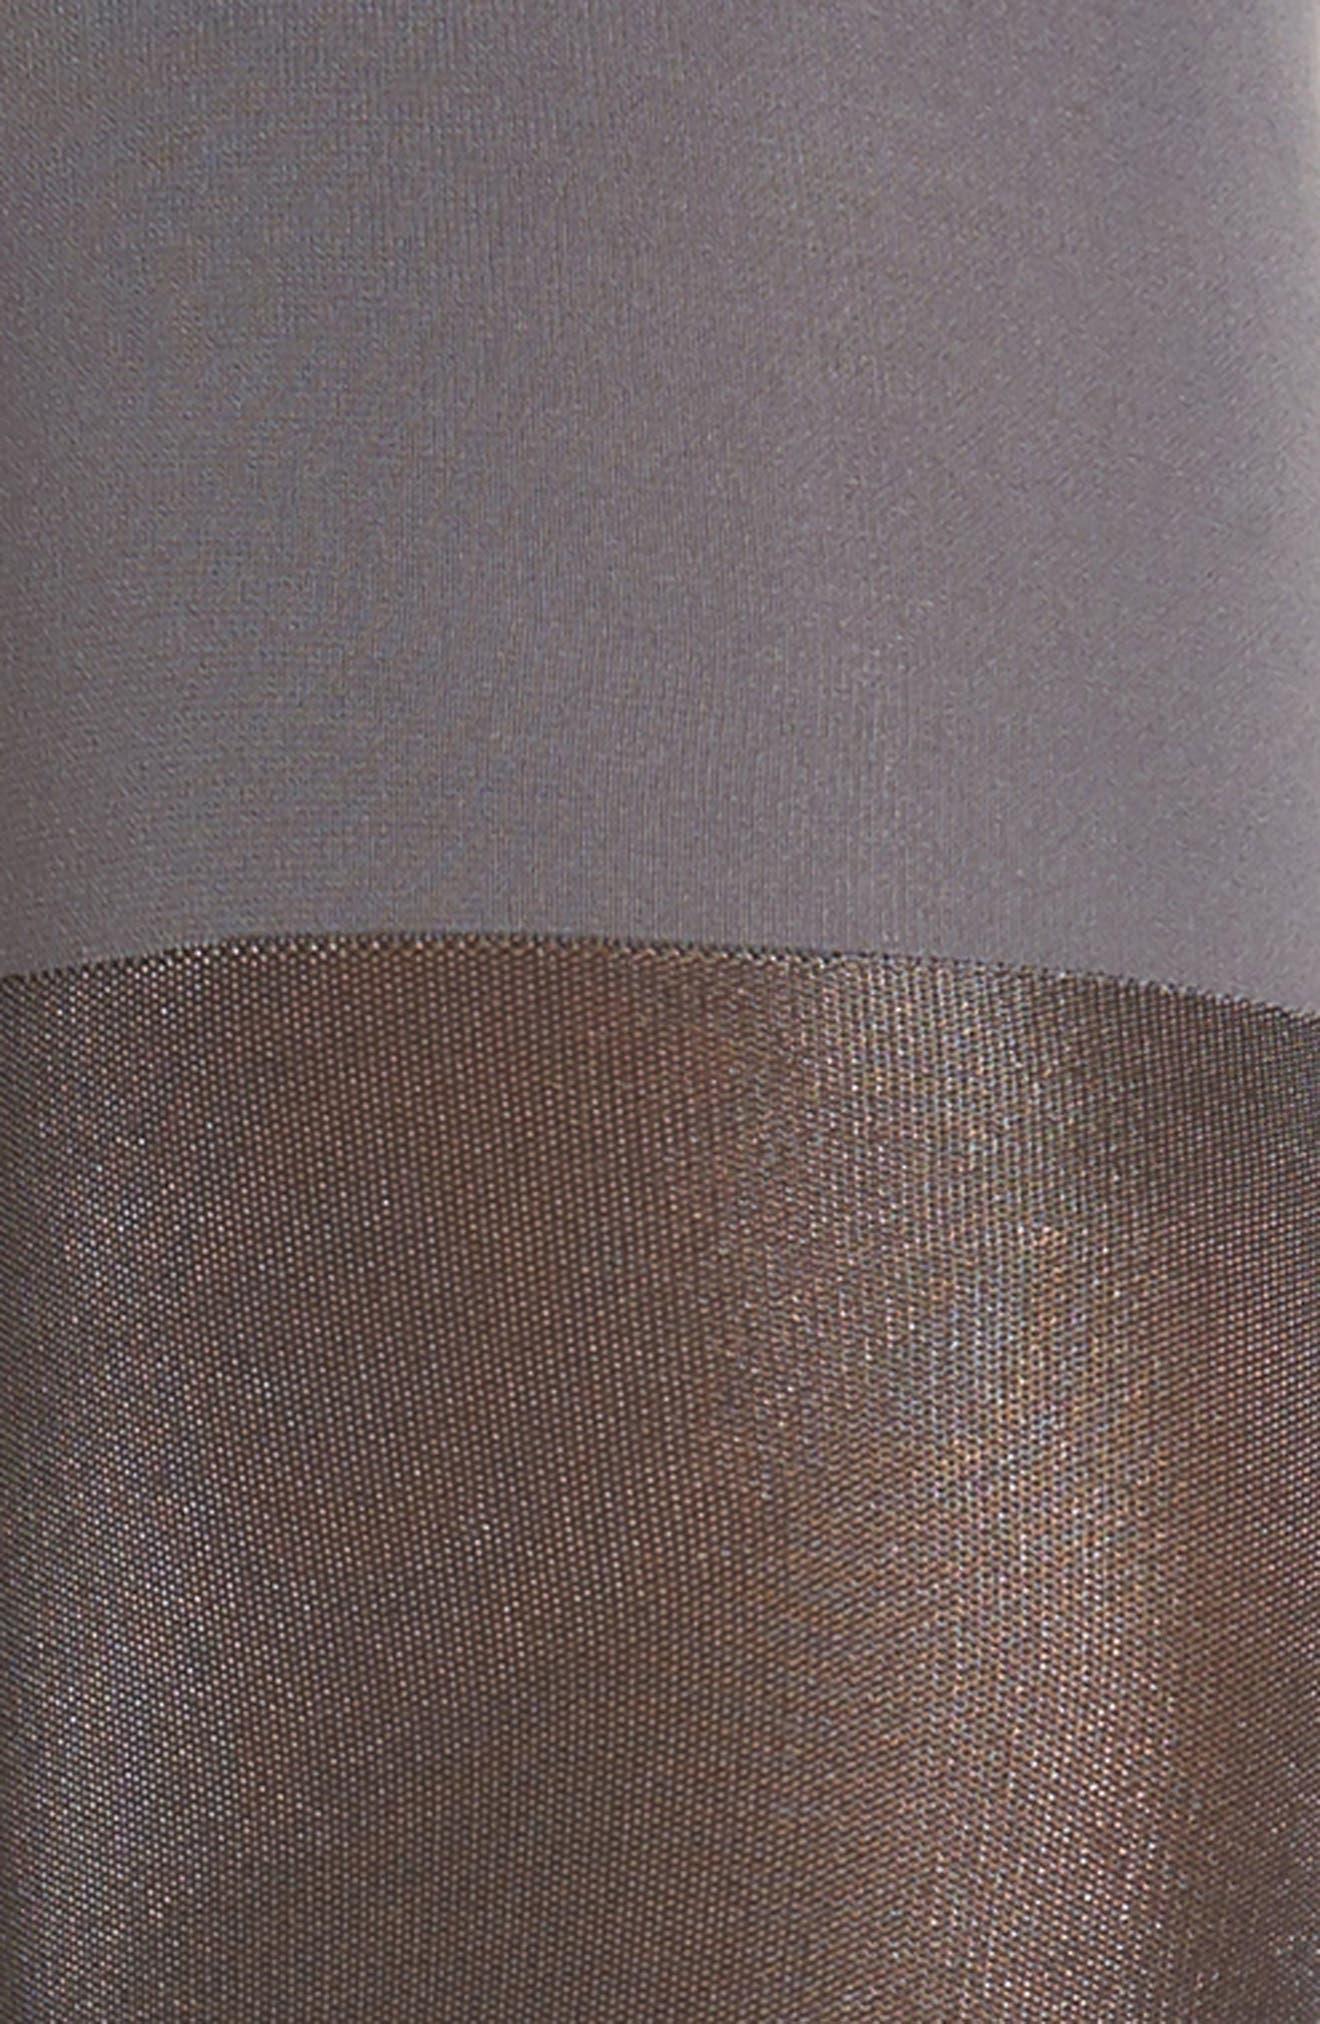 Metallic Shimmer Mid Thigh Shaping Tights,                             Alternate thumbnail 2, color,                             020